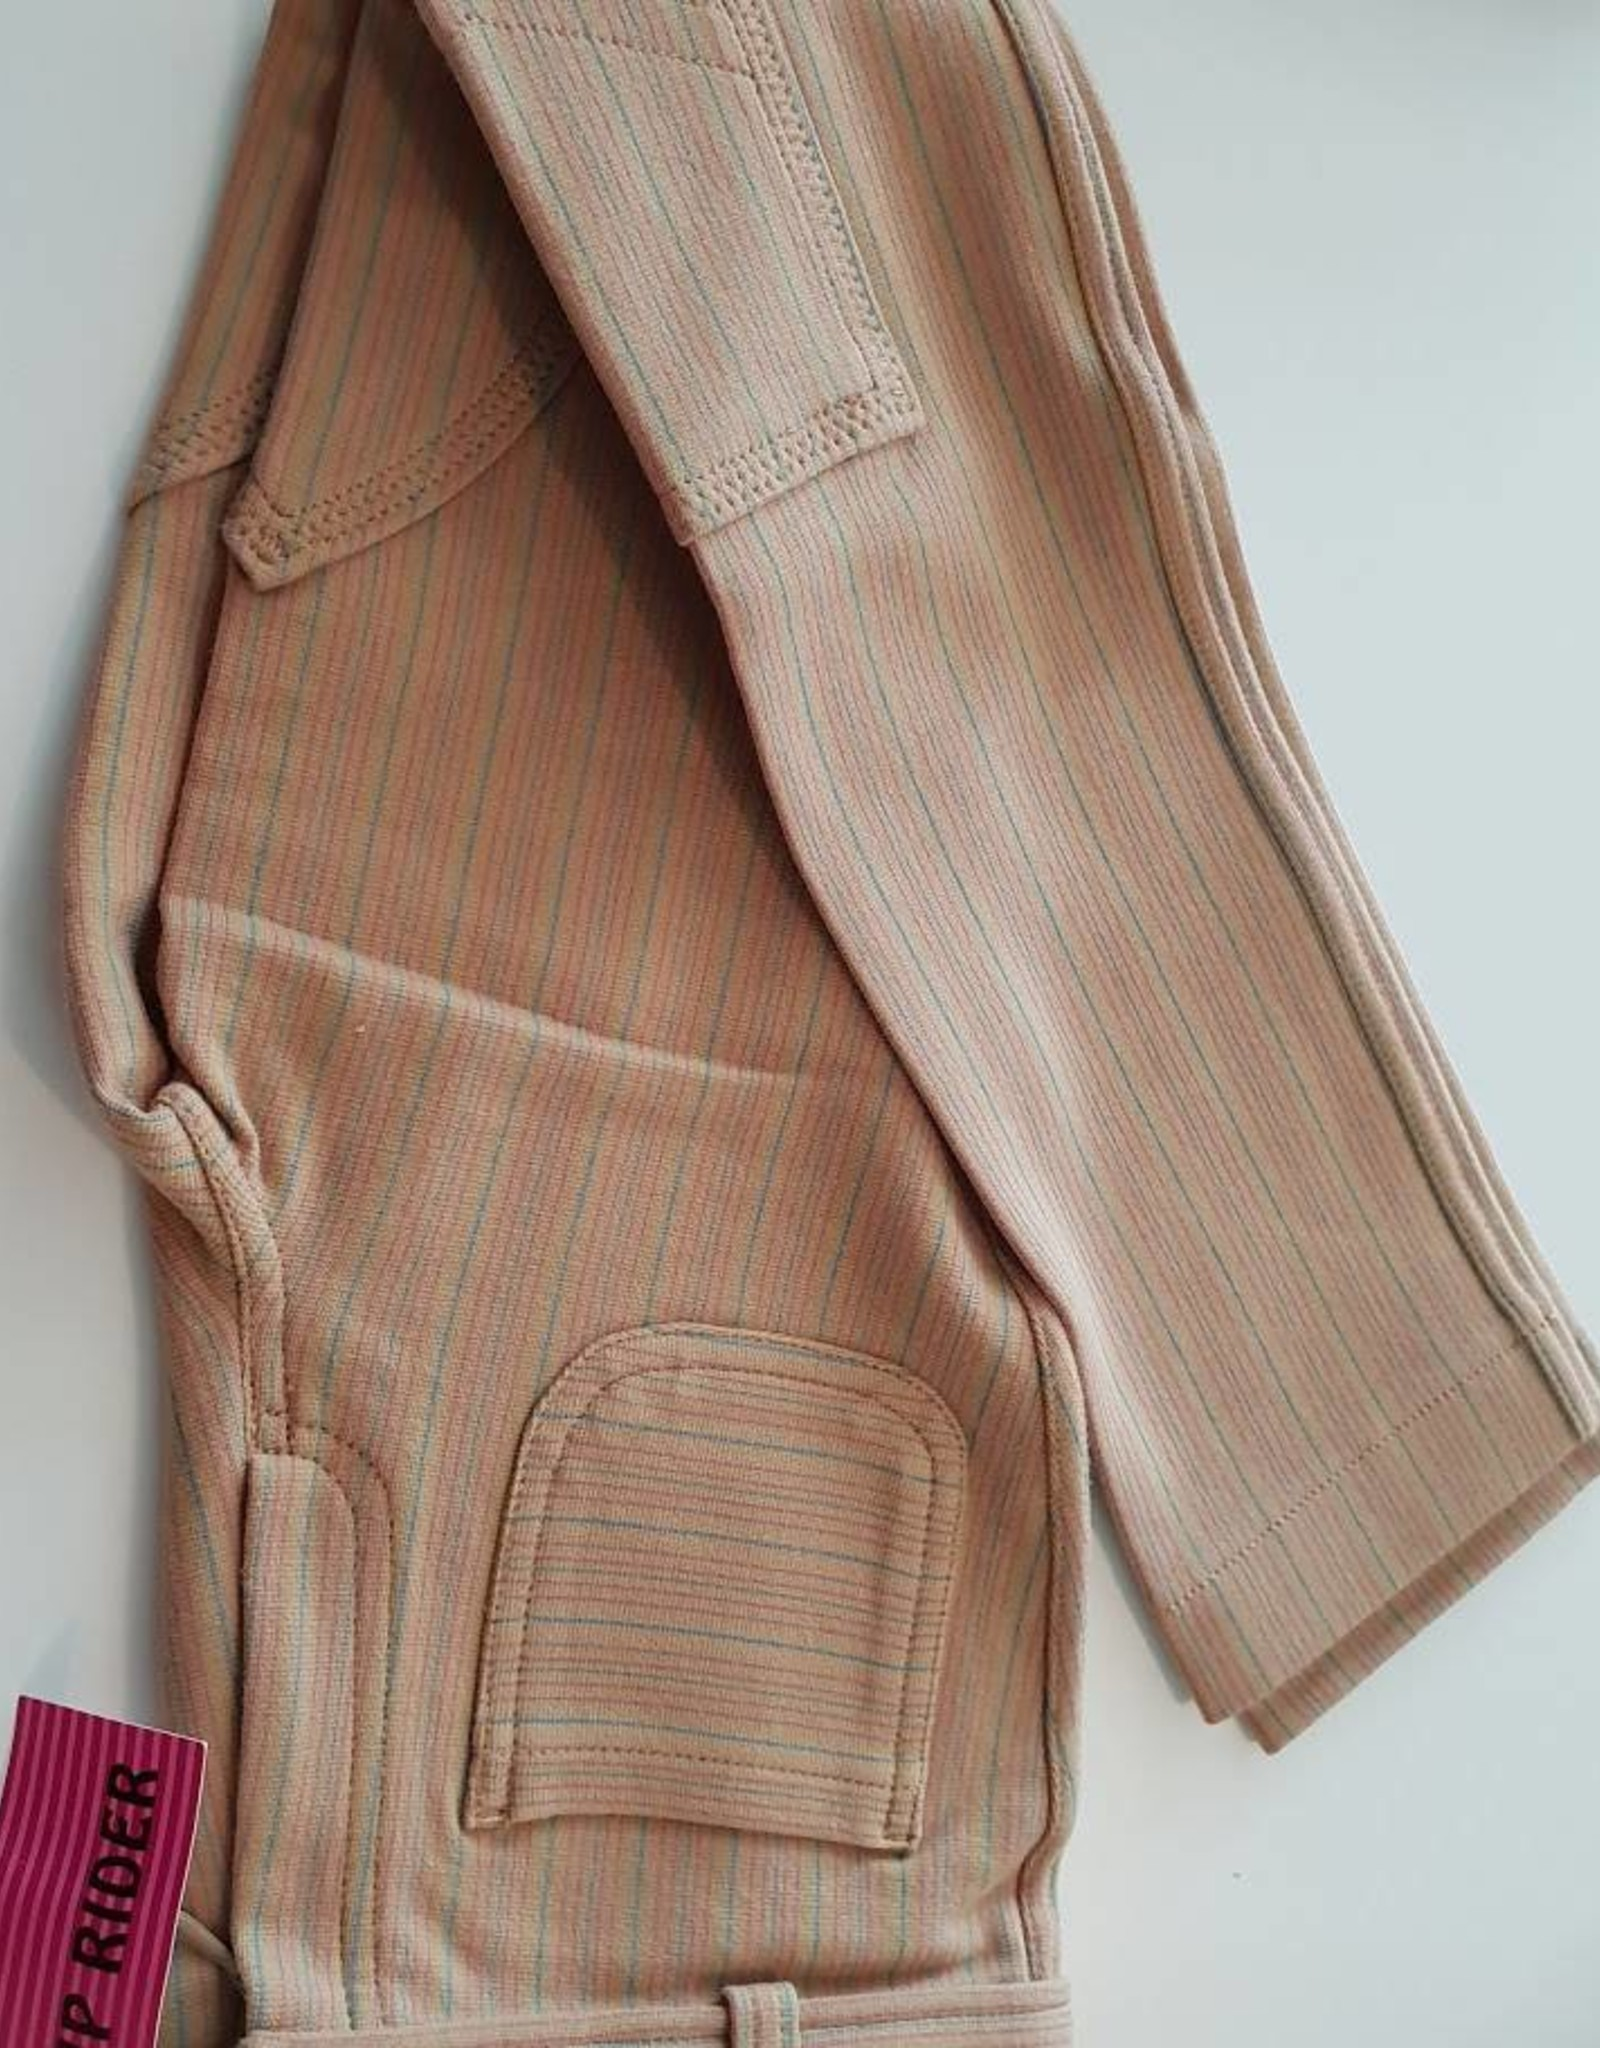 Windsor Apparel Jodhpur Hipster - Beige with Pink/Green Stripe - Childs Size 10